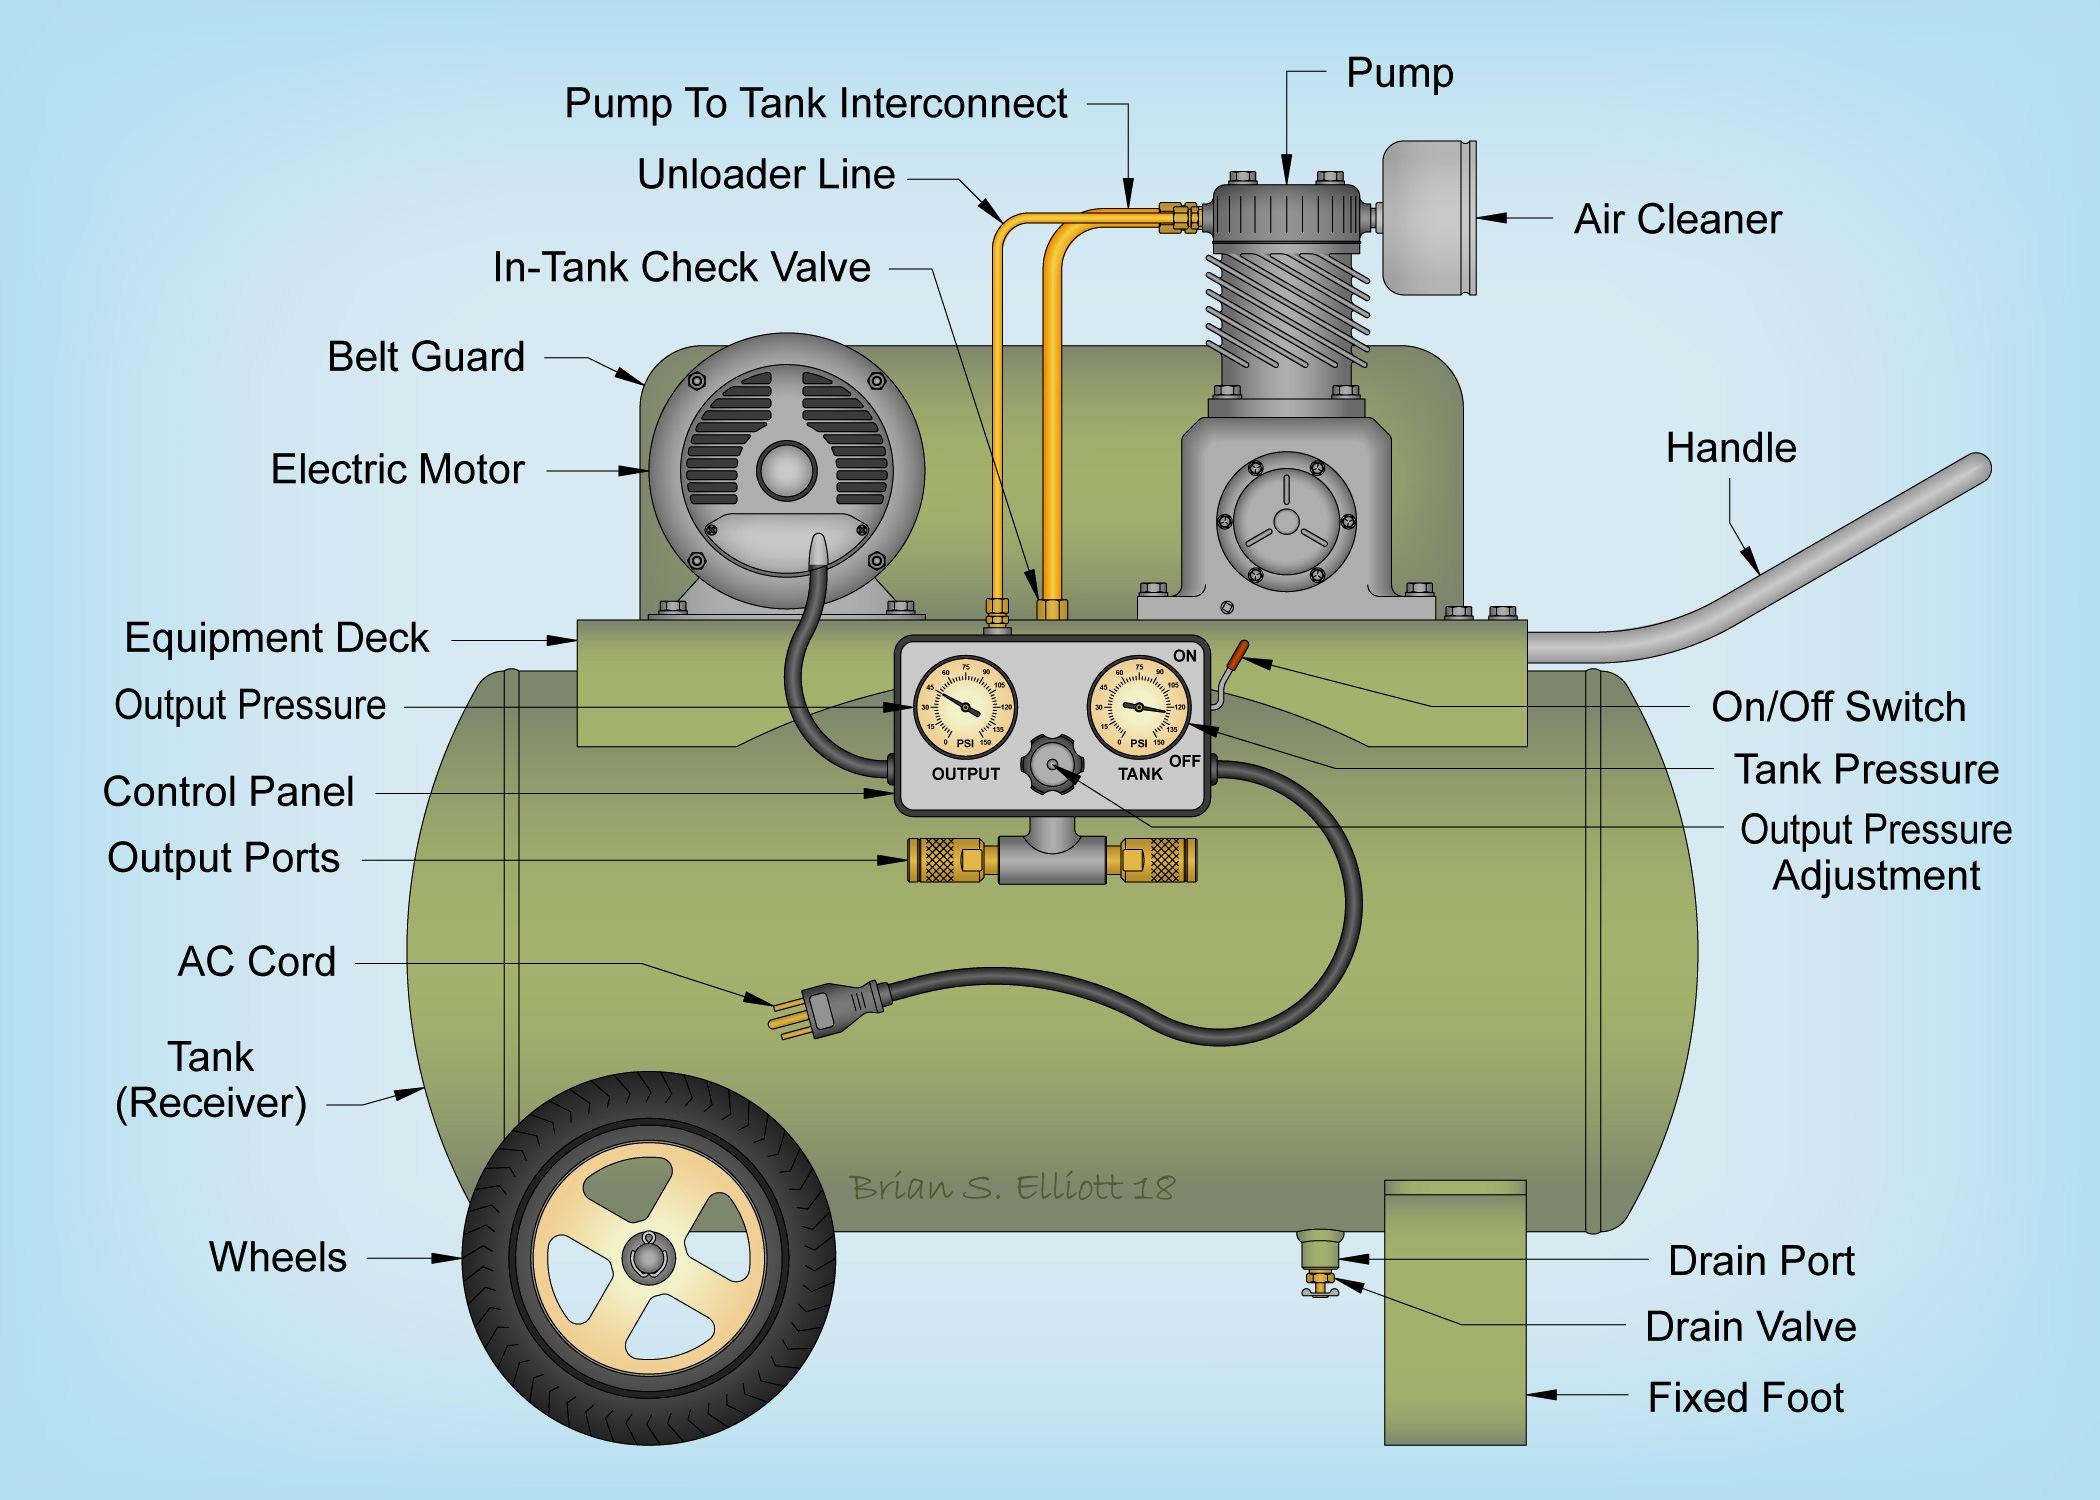 Air compressor - Wikiwand on a c compressor diagram, fan diagram, compressor parts, compressor pump diagram, compressor engine diagram, freezer diagram, compressor troubleshooting diagram, compressor hose, hvac compressor diagram, compressor capacitor, compressor valve, basic refrigeration diagram, compressor piston, compressor clutch, compressor motor, compressor regulator diagram, viper 5704v remote start diagram, cooling diagram, voltage drop diagram, compressor plumbing diagram,